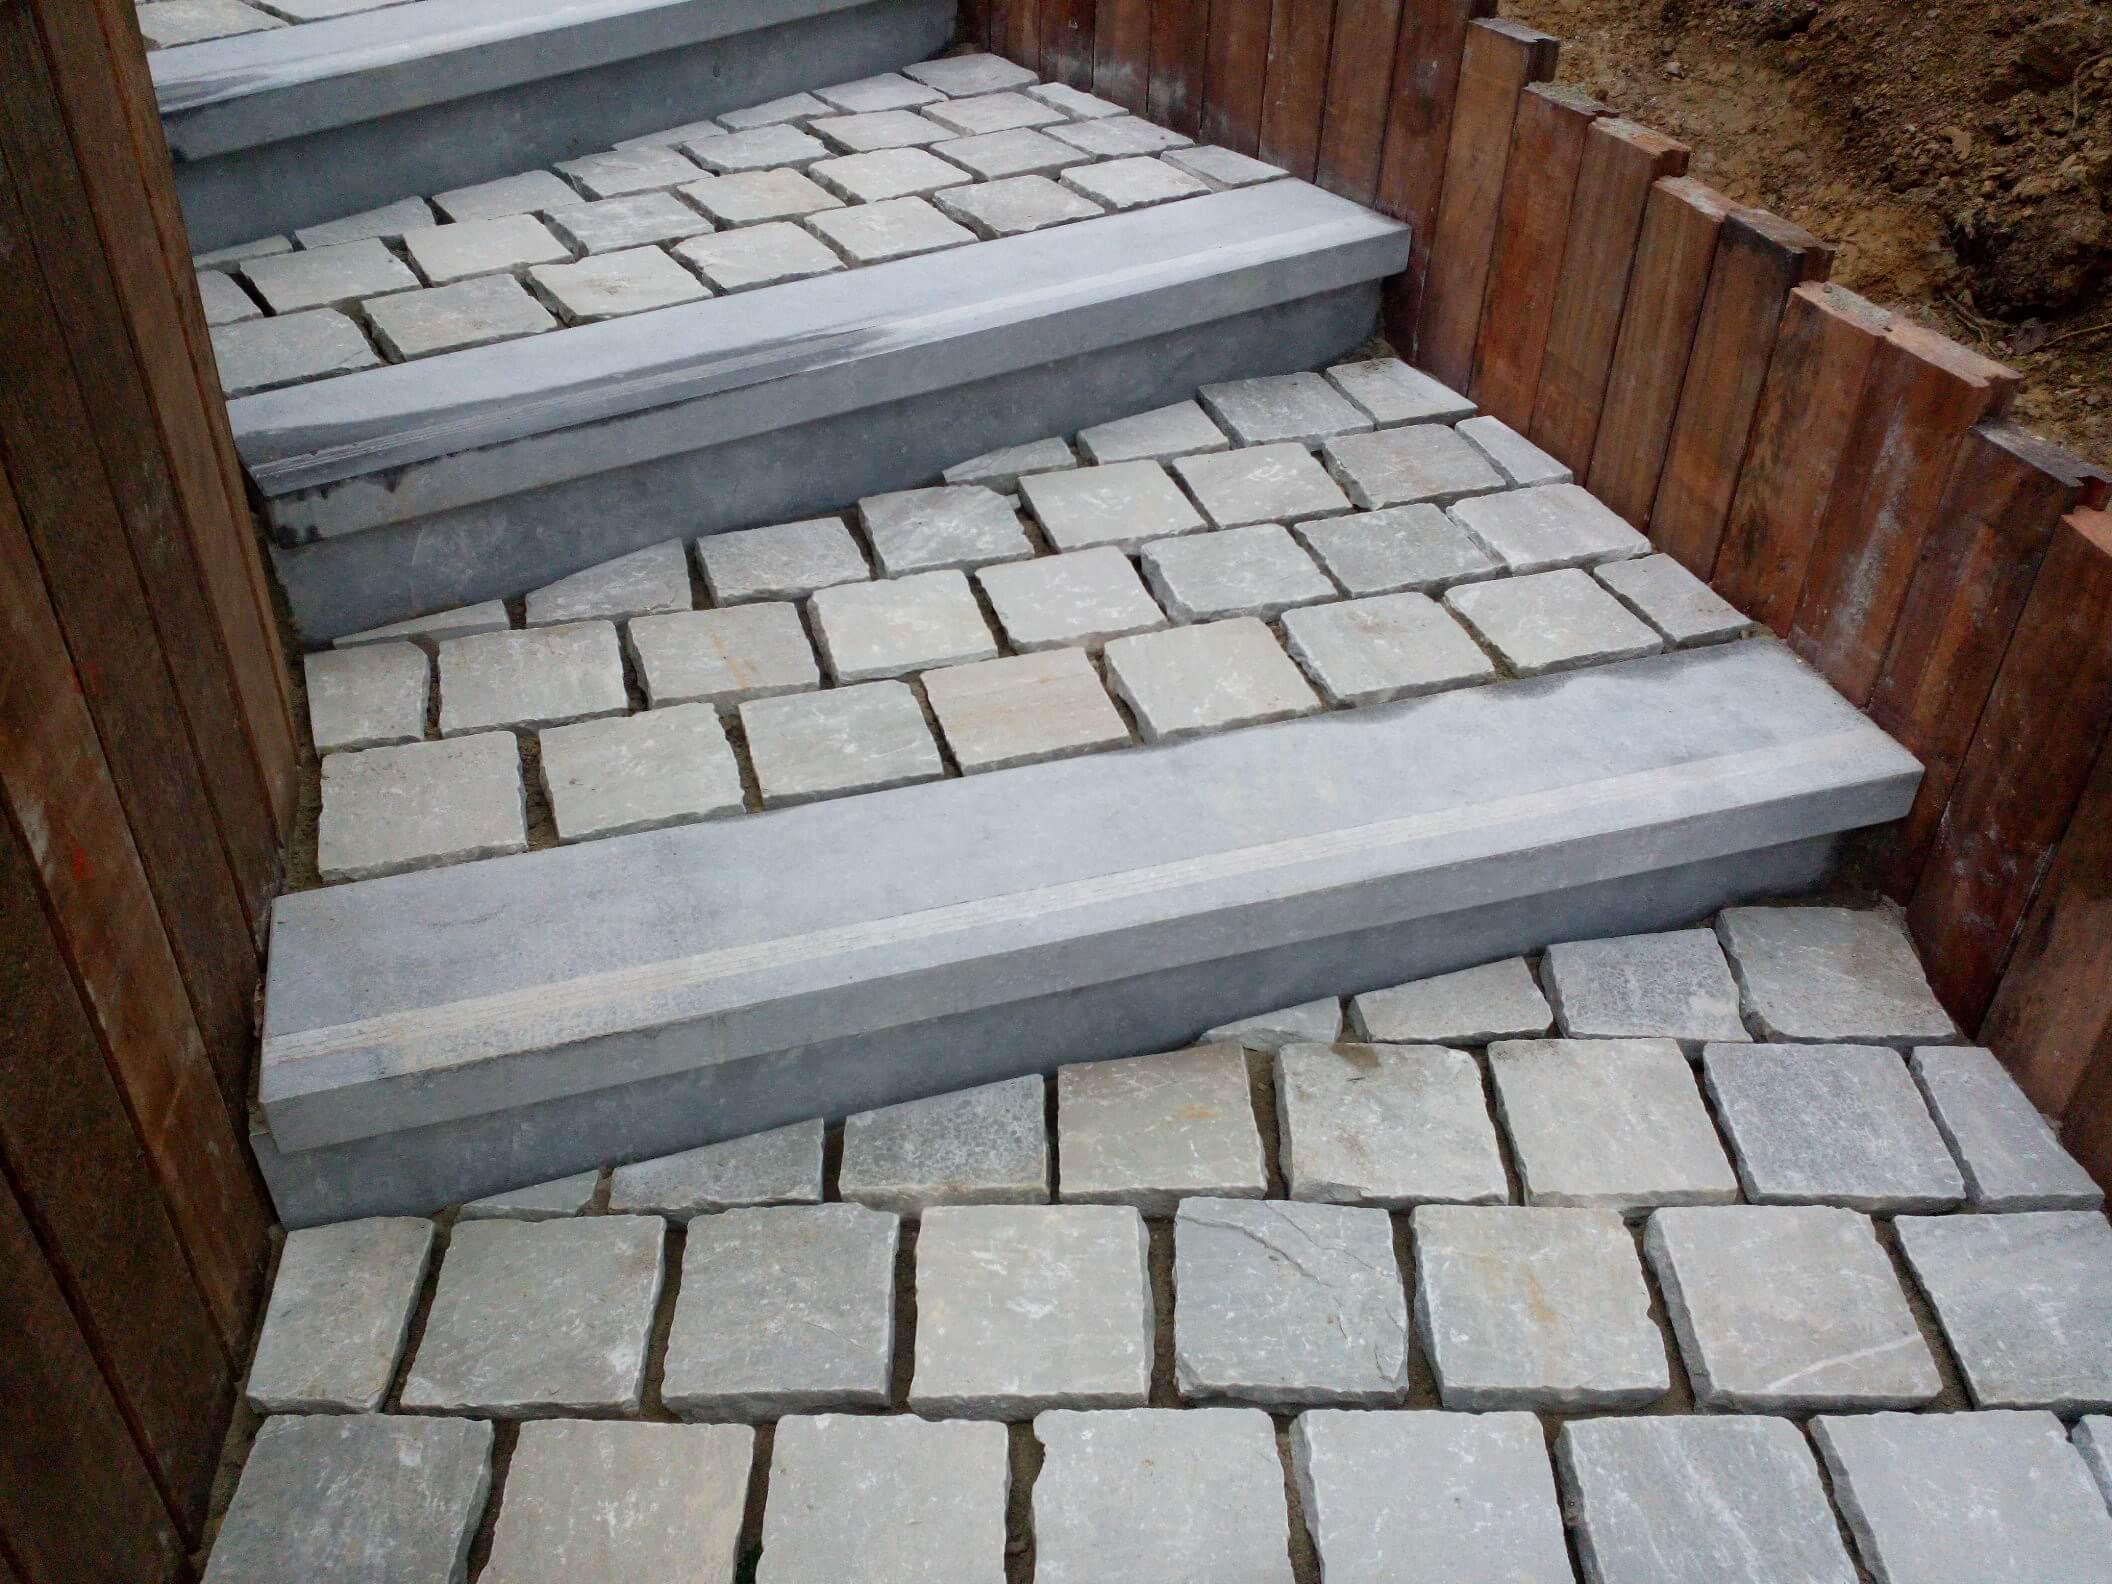 pav kandla retenue de terre azob escalier pierre bleue. Black Bedroom Furniture Sets. Home Design Ideas